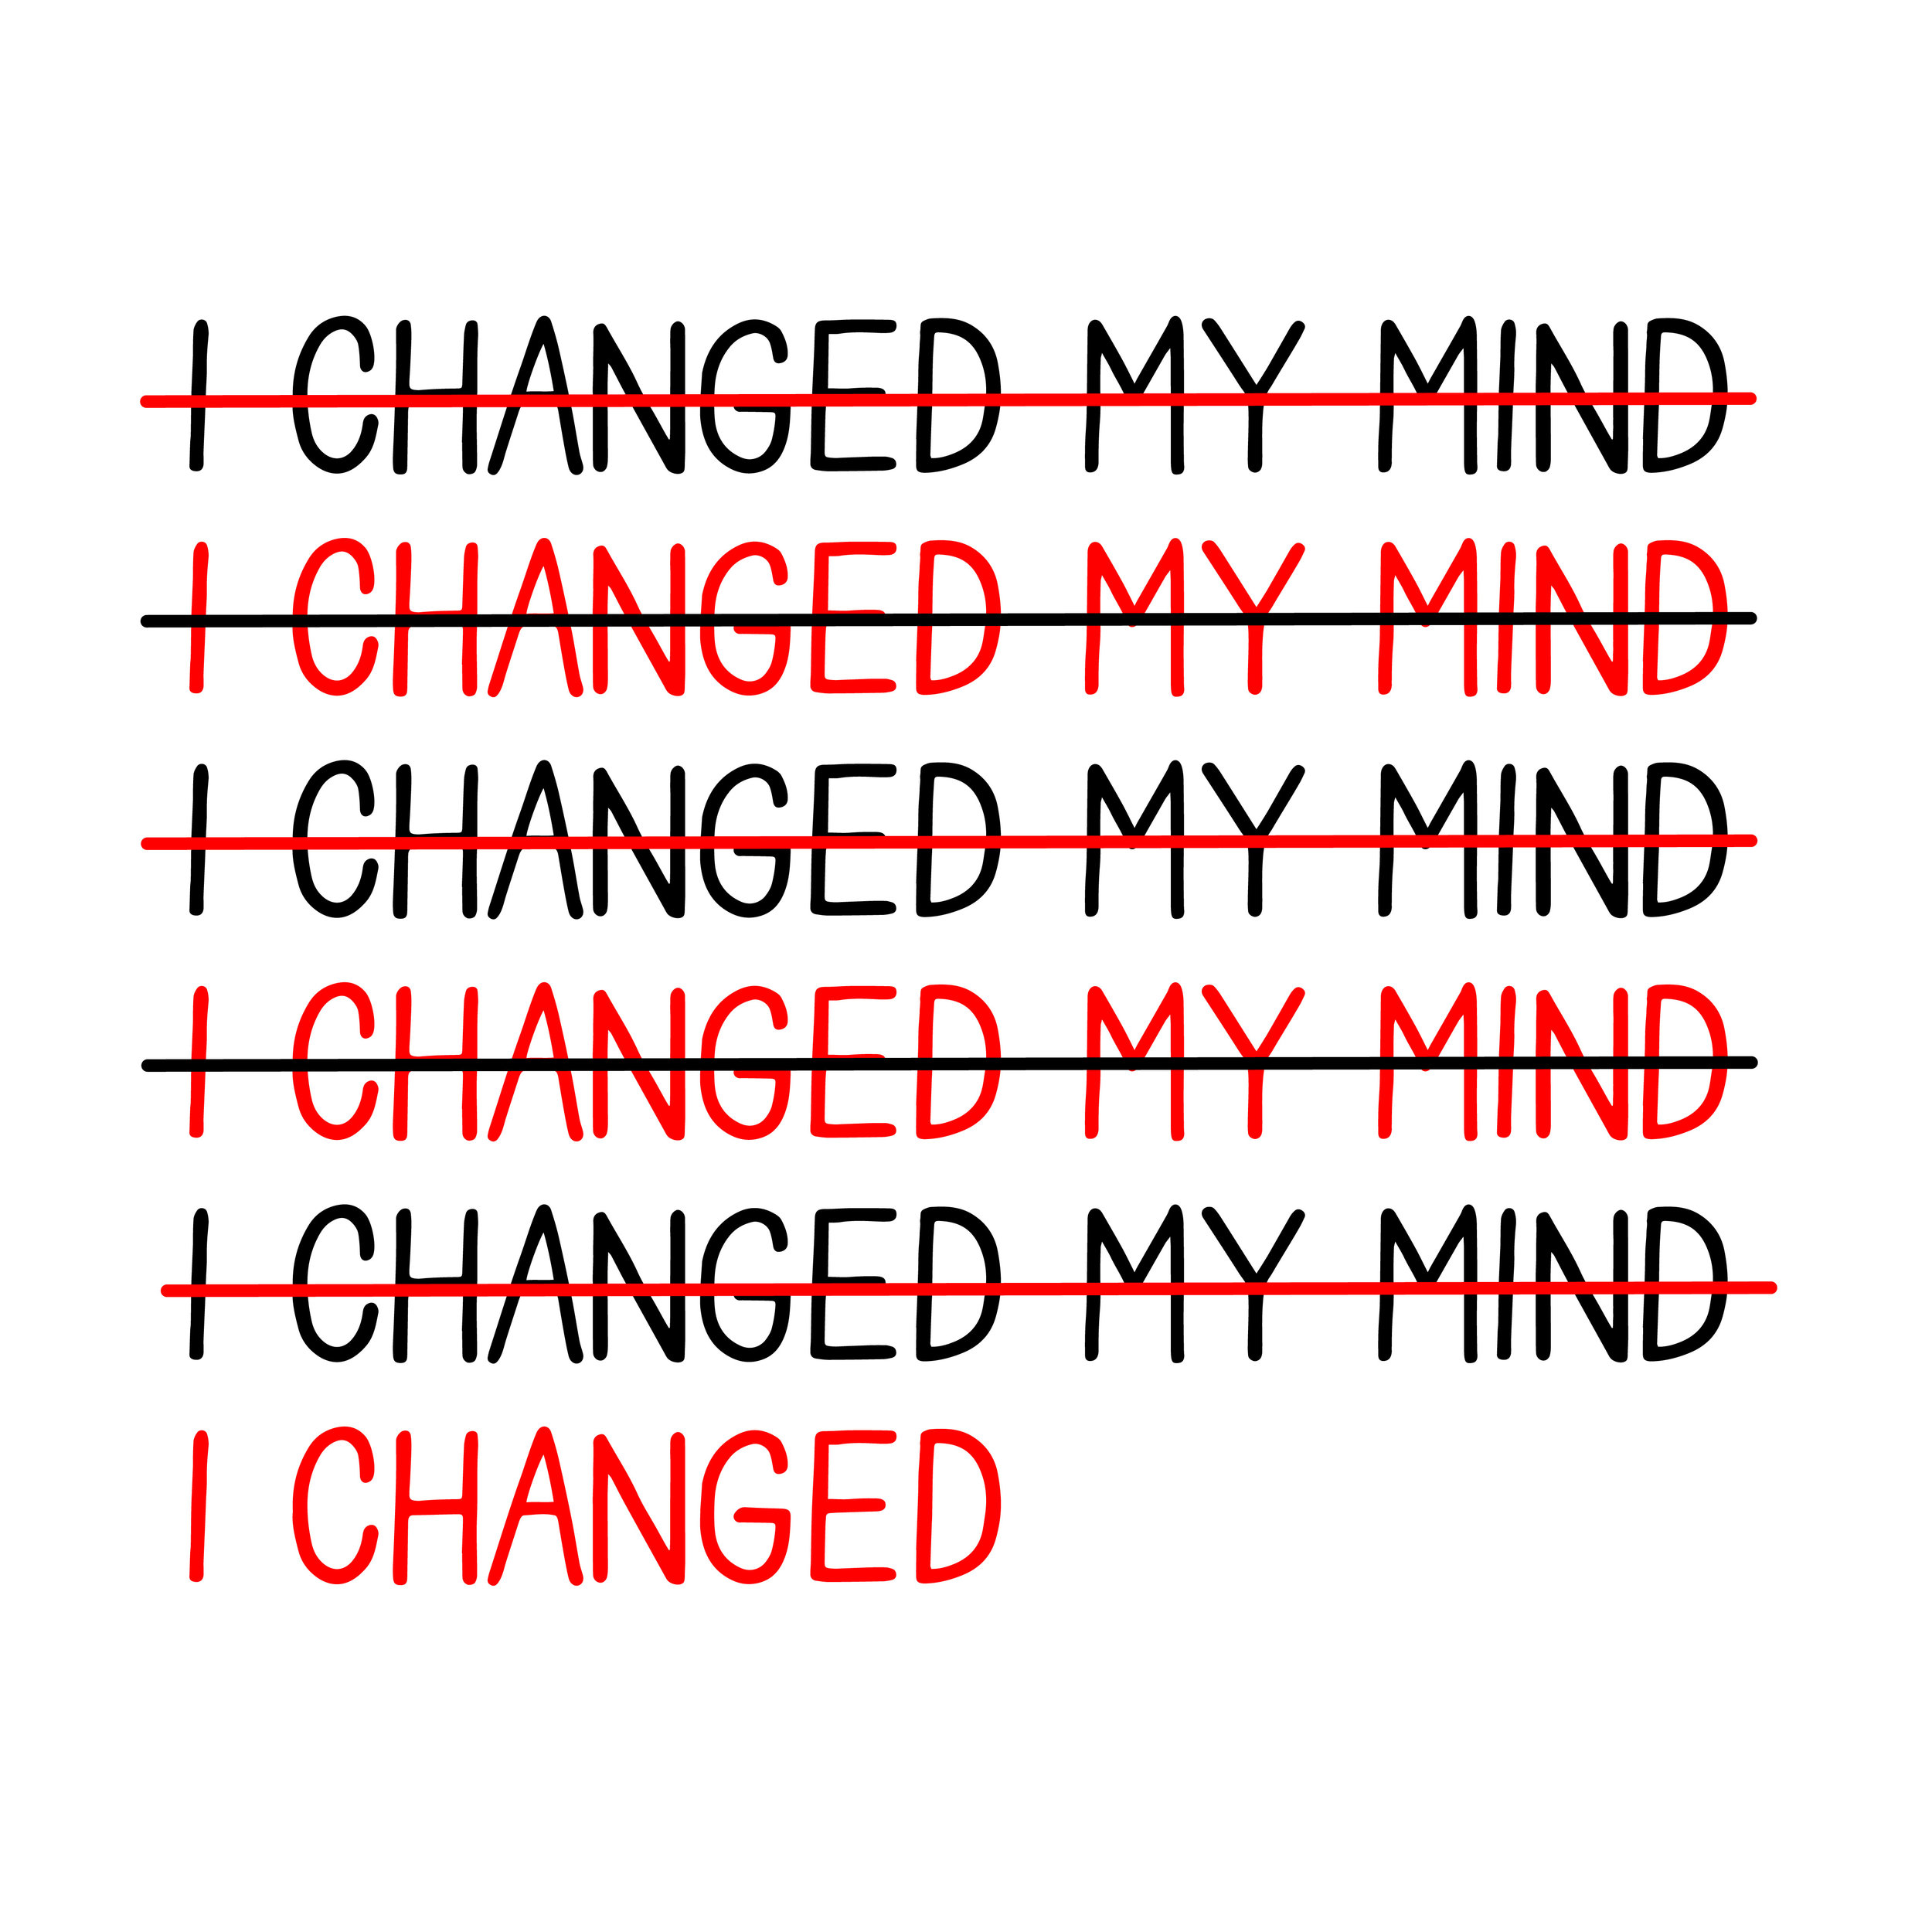 CHANGEDMYMIND-01.jpg